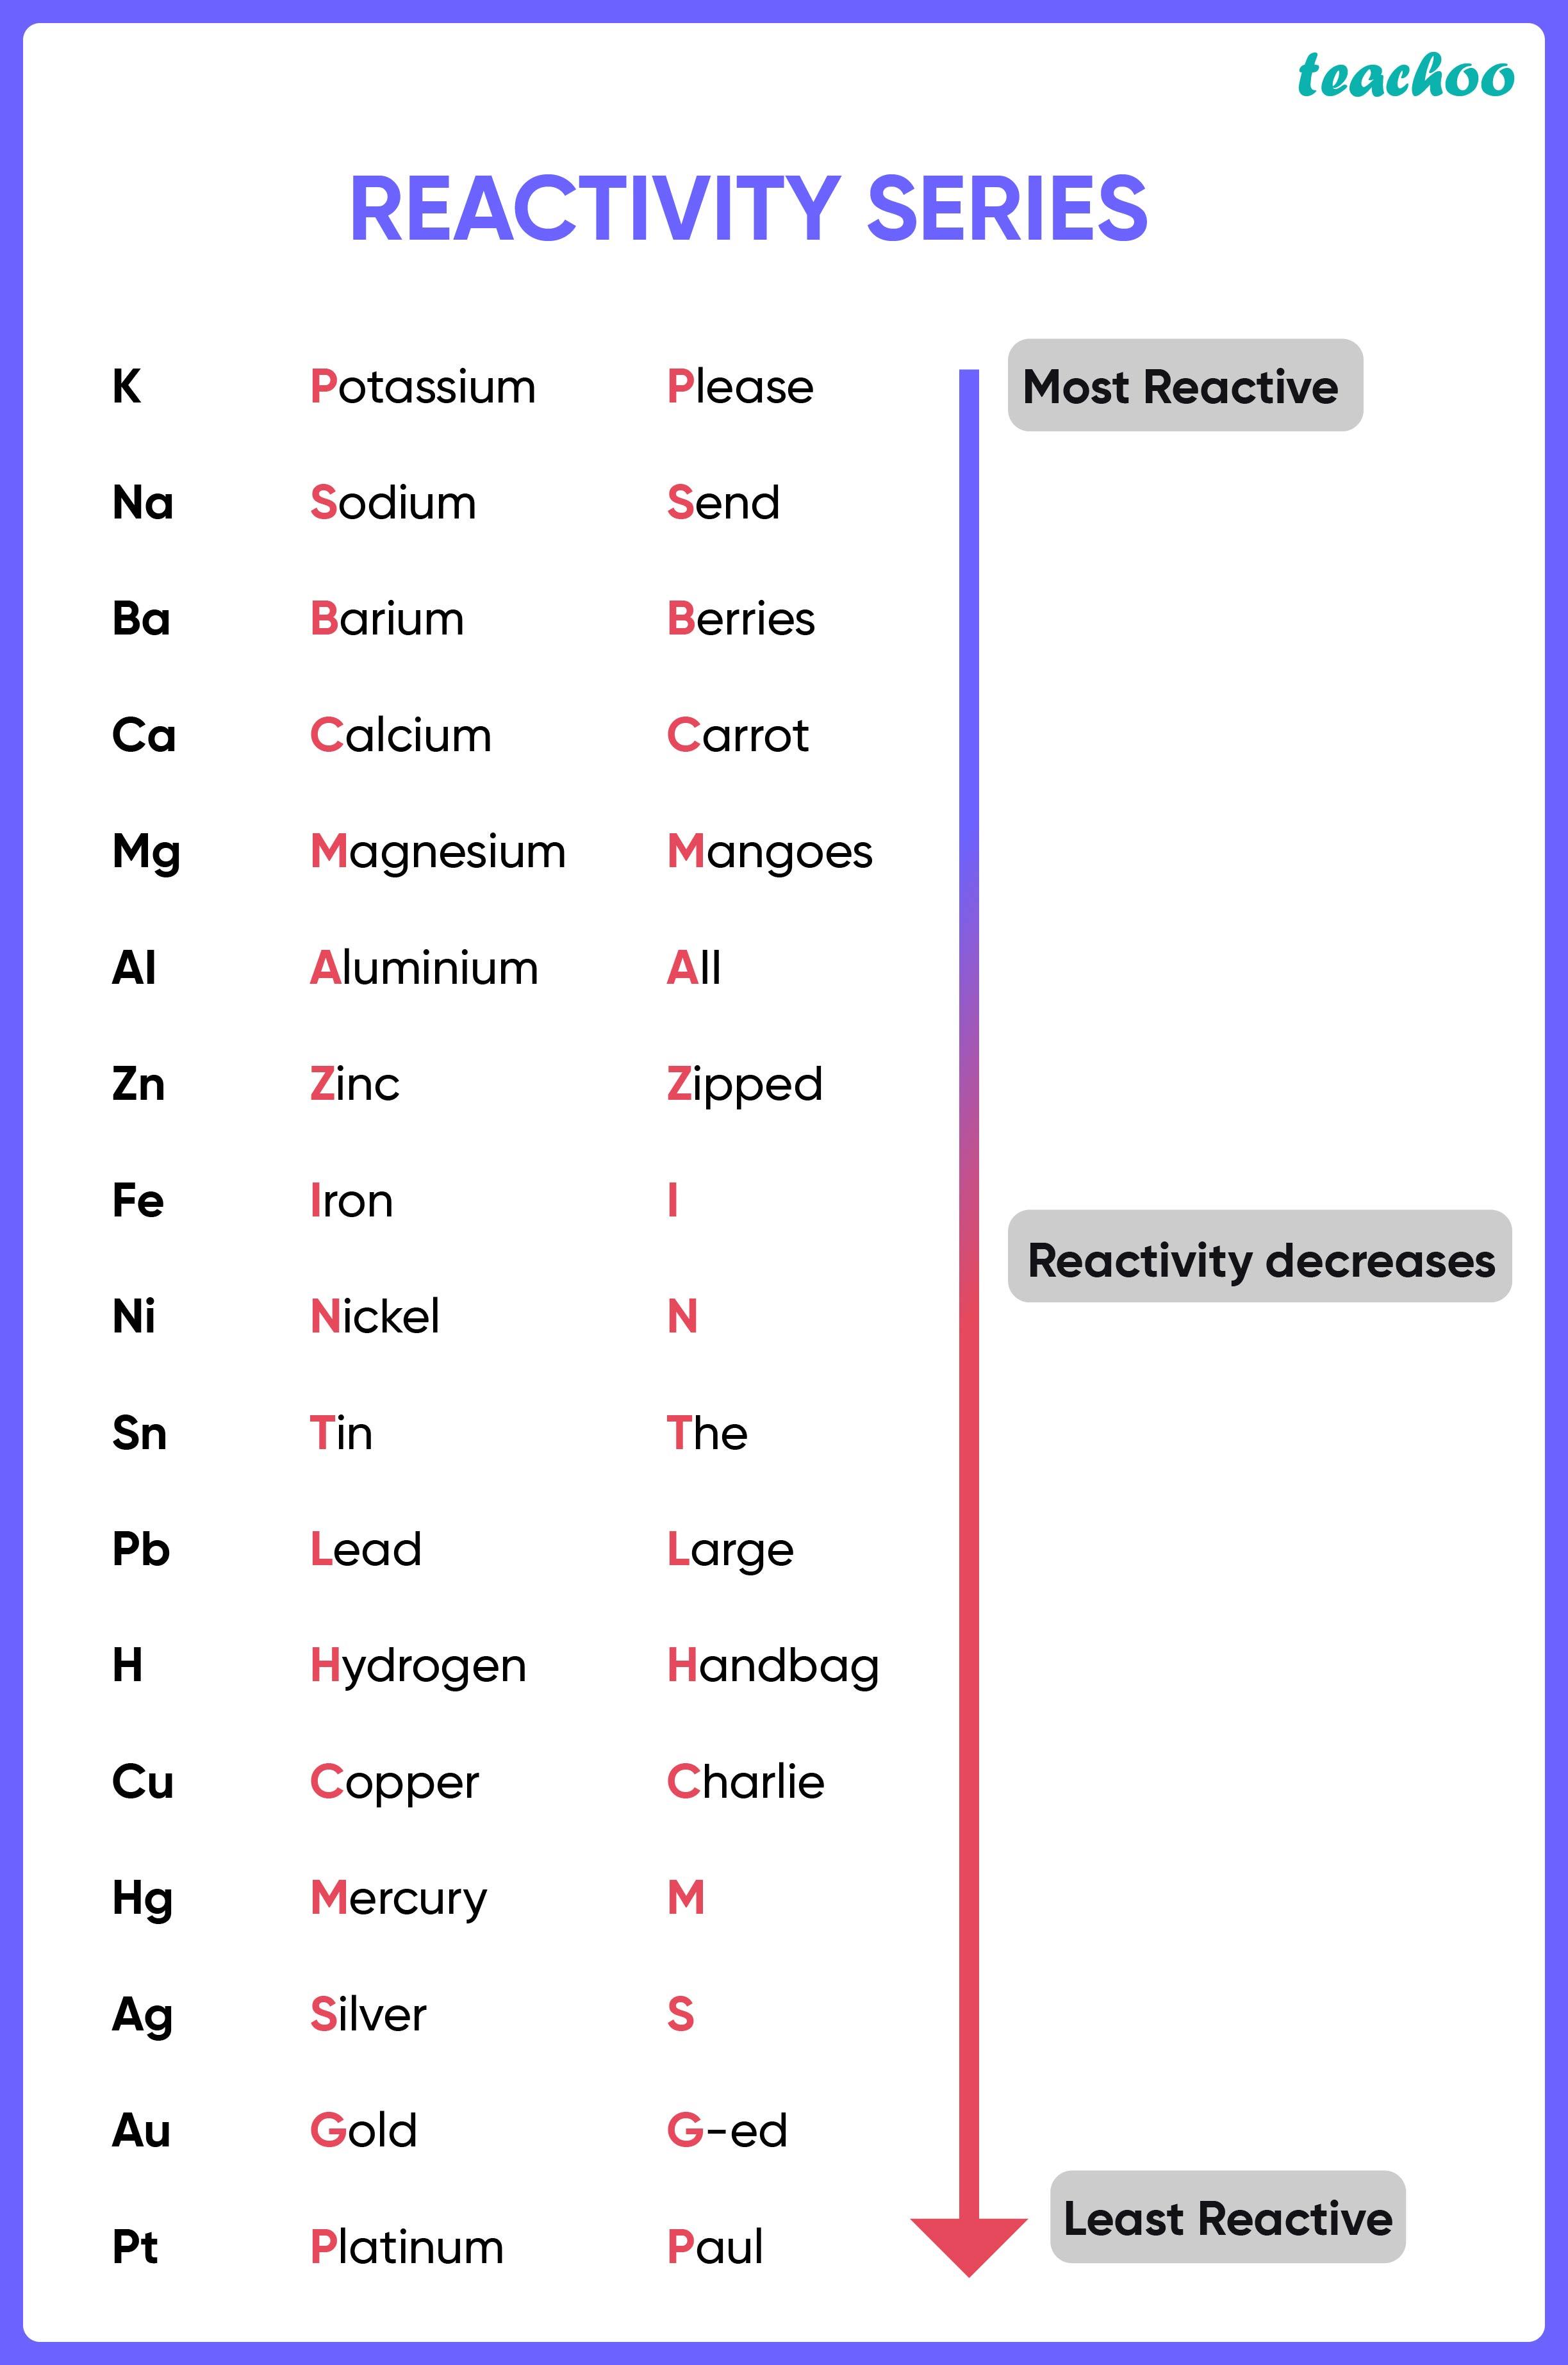 Reactivity Series-Teachoo.jpg